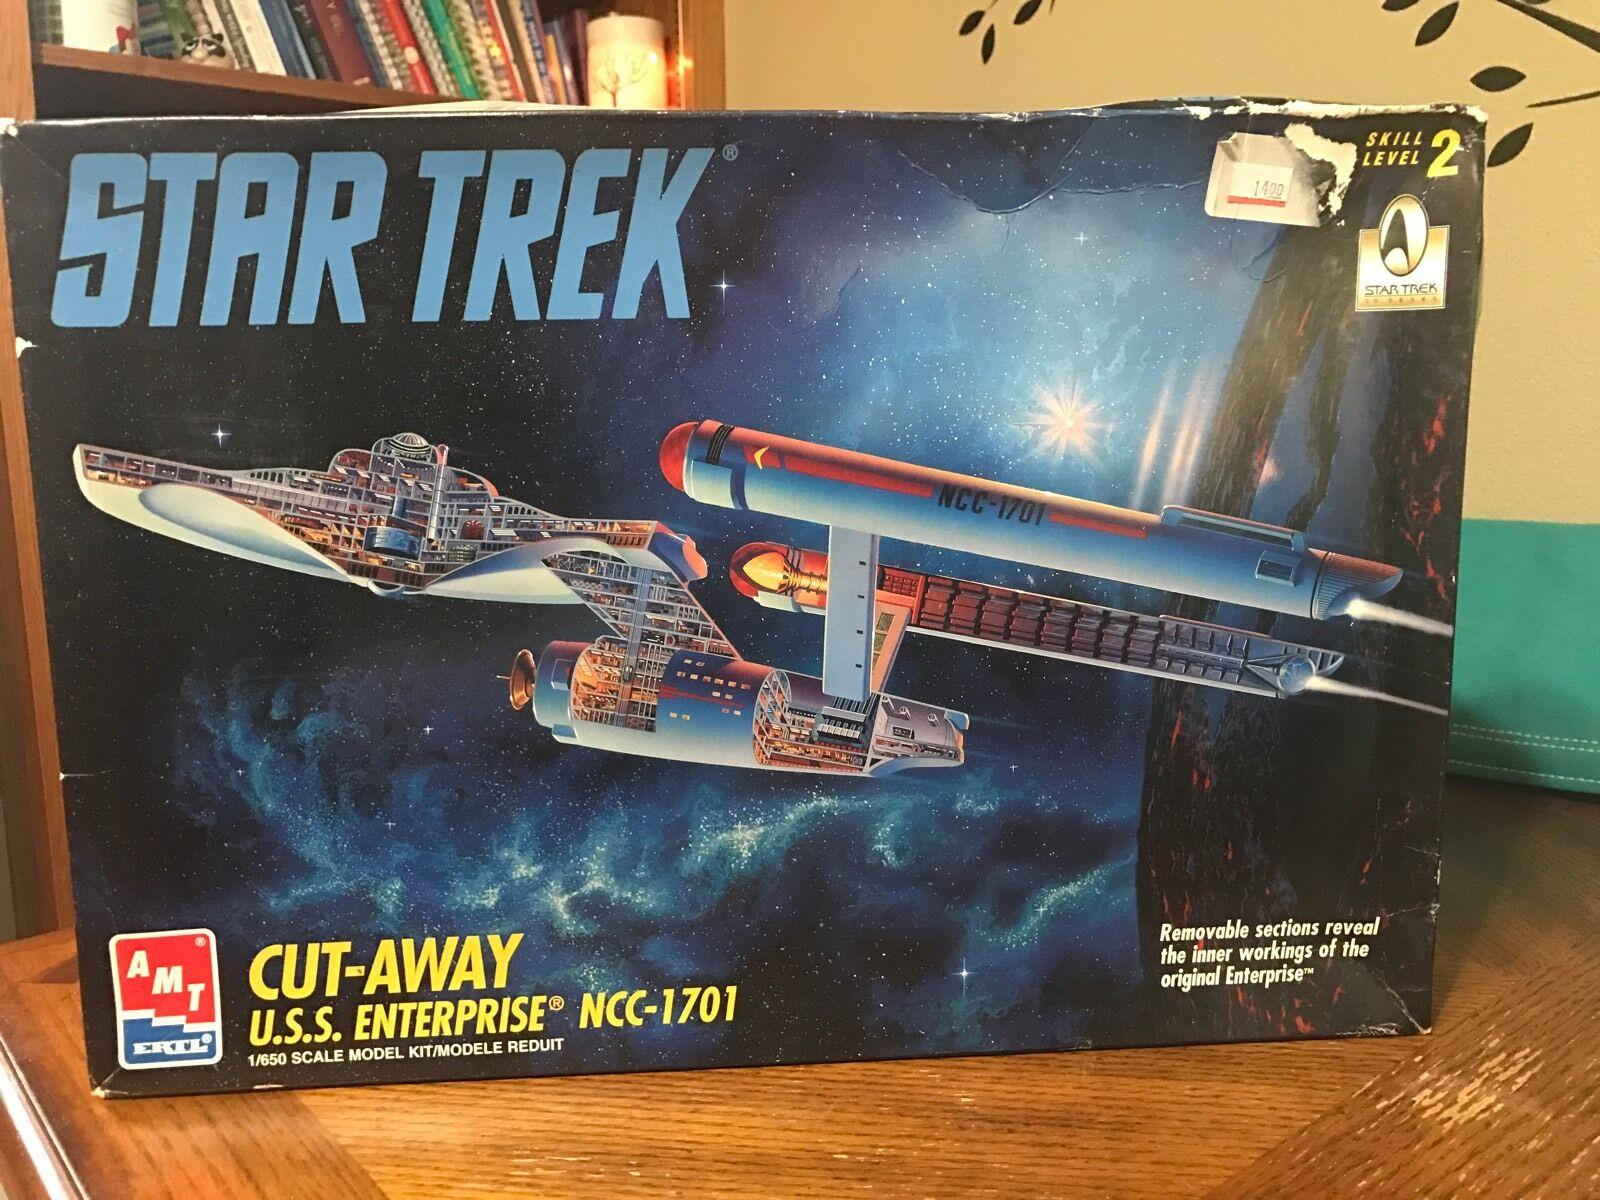 Original Star Trek USS Enterprise Modelo De Aluminio Modelo De Corte Juguetes 8790